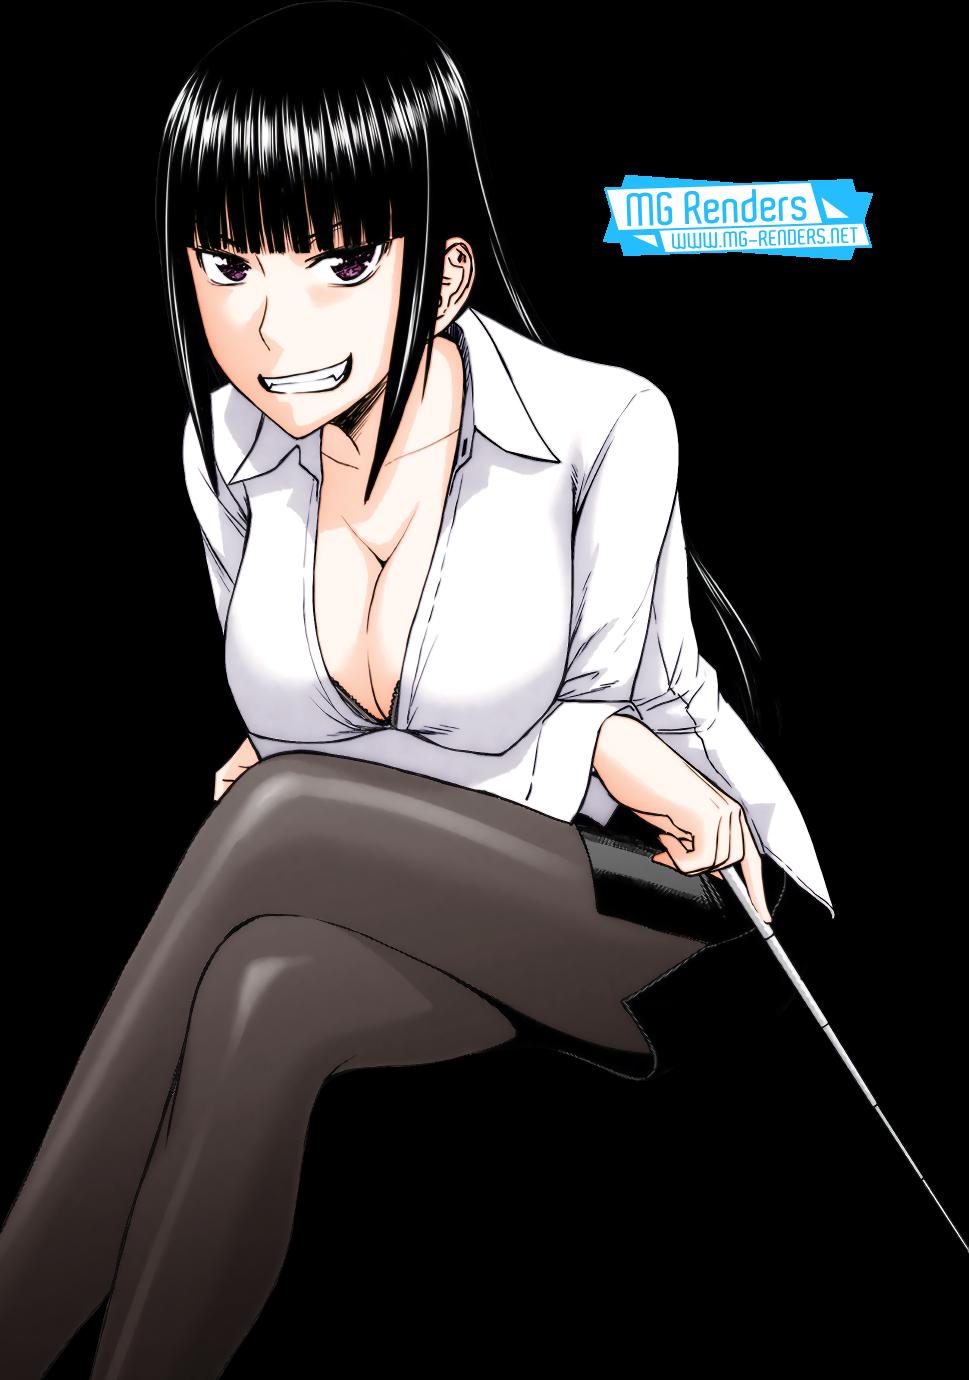 Tags: Anime, Render,  Collared shirt,  Crossed Legs,  Inomaru,  Knees,  Kurozumi Ayane,  Skirt,  Tama Kick, PNG, Image, Picture